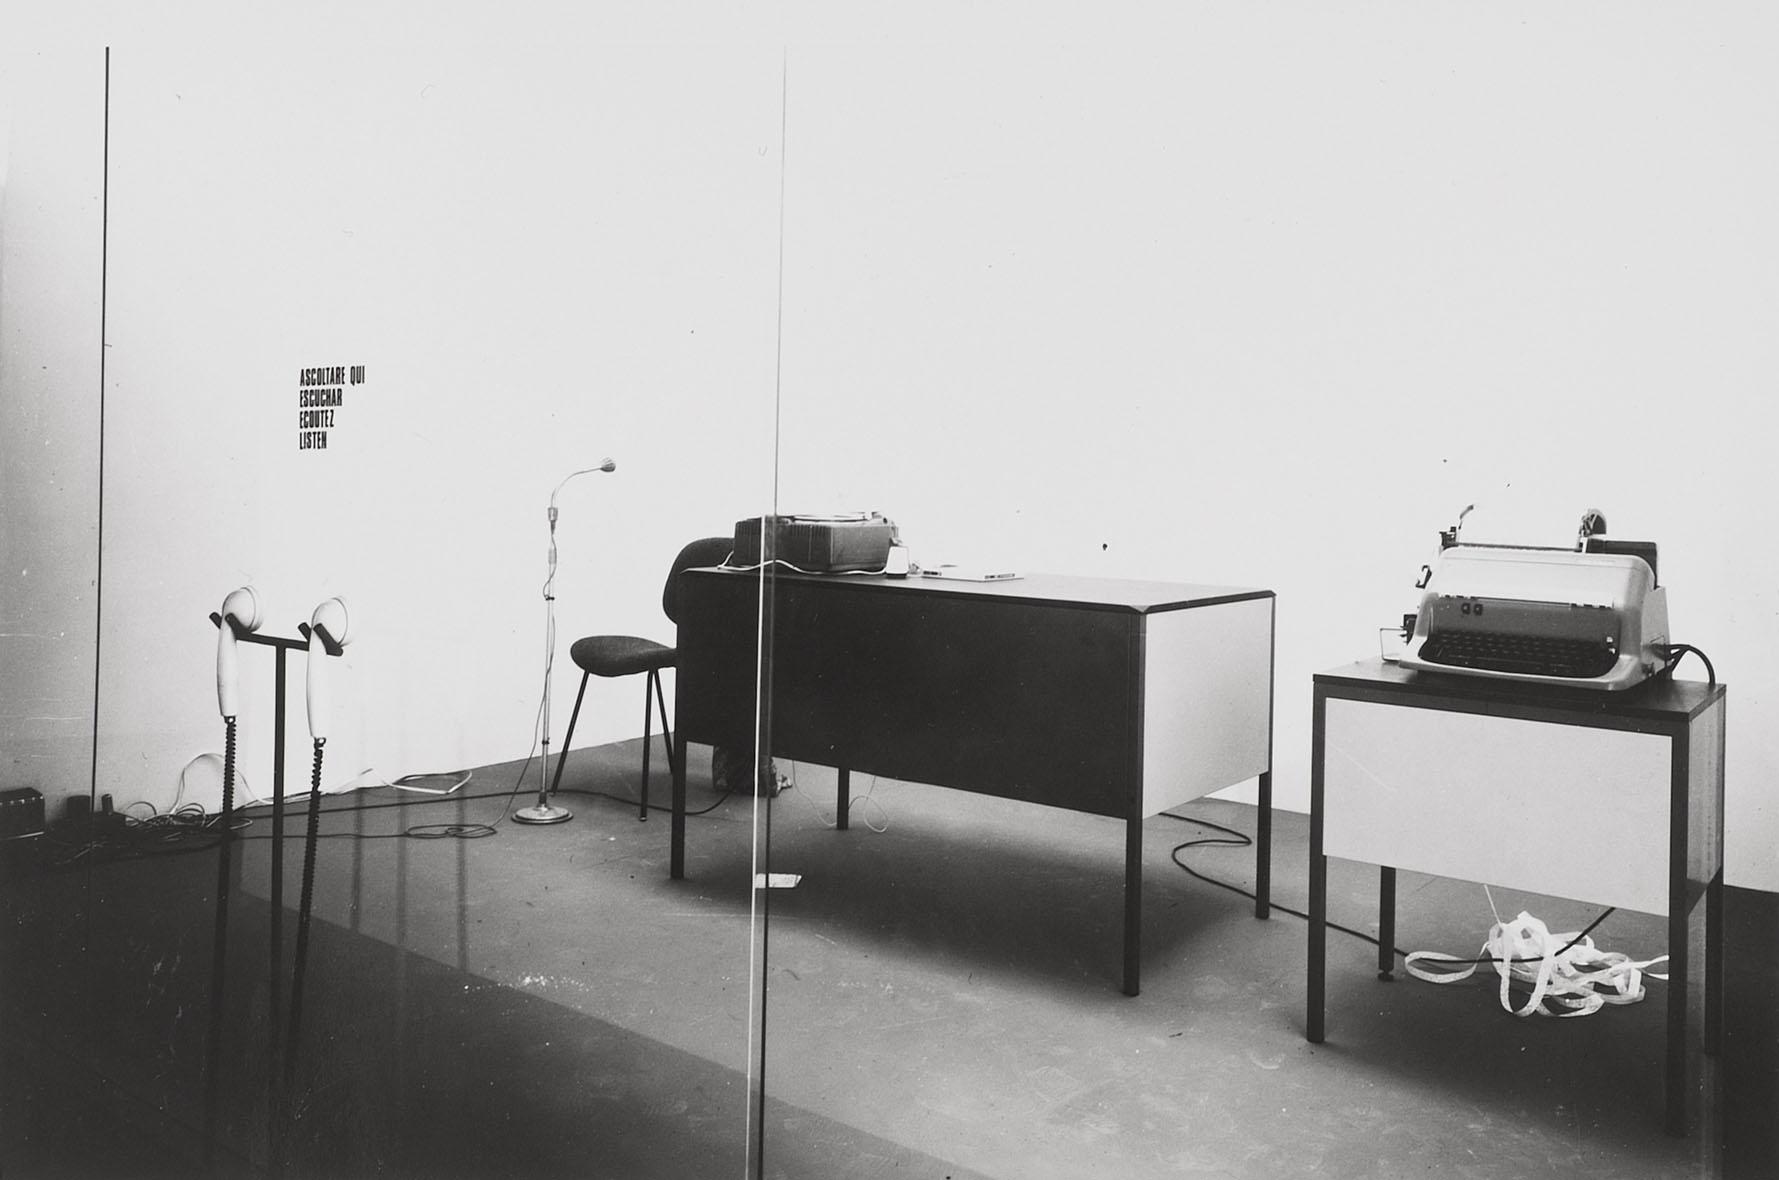 David Lamelas Venice Biennale 1968